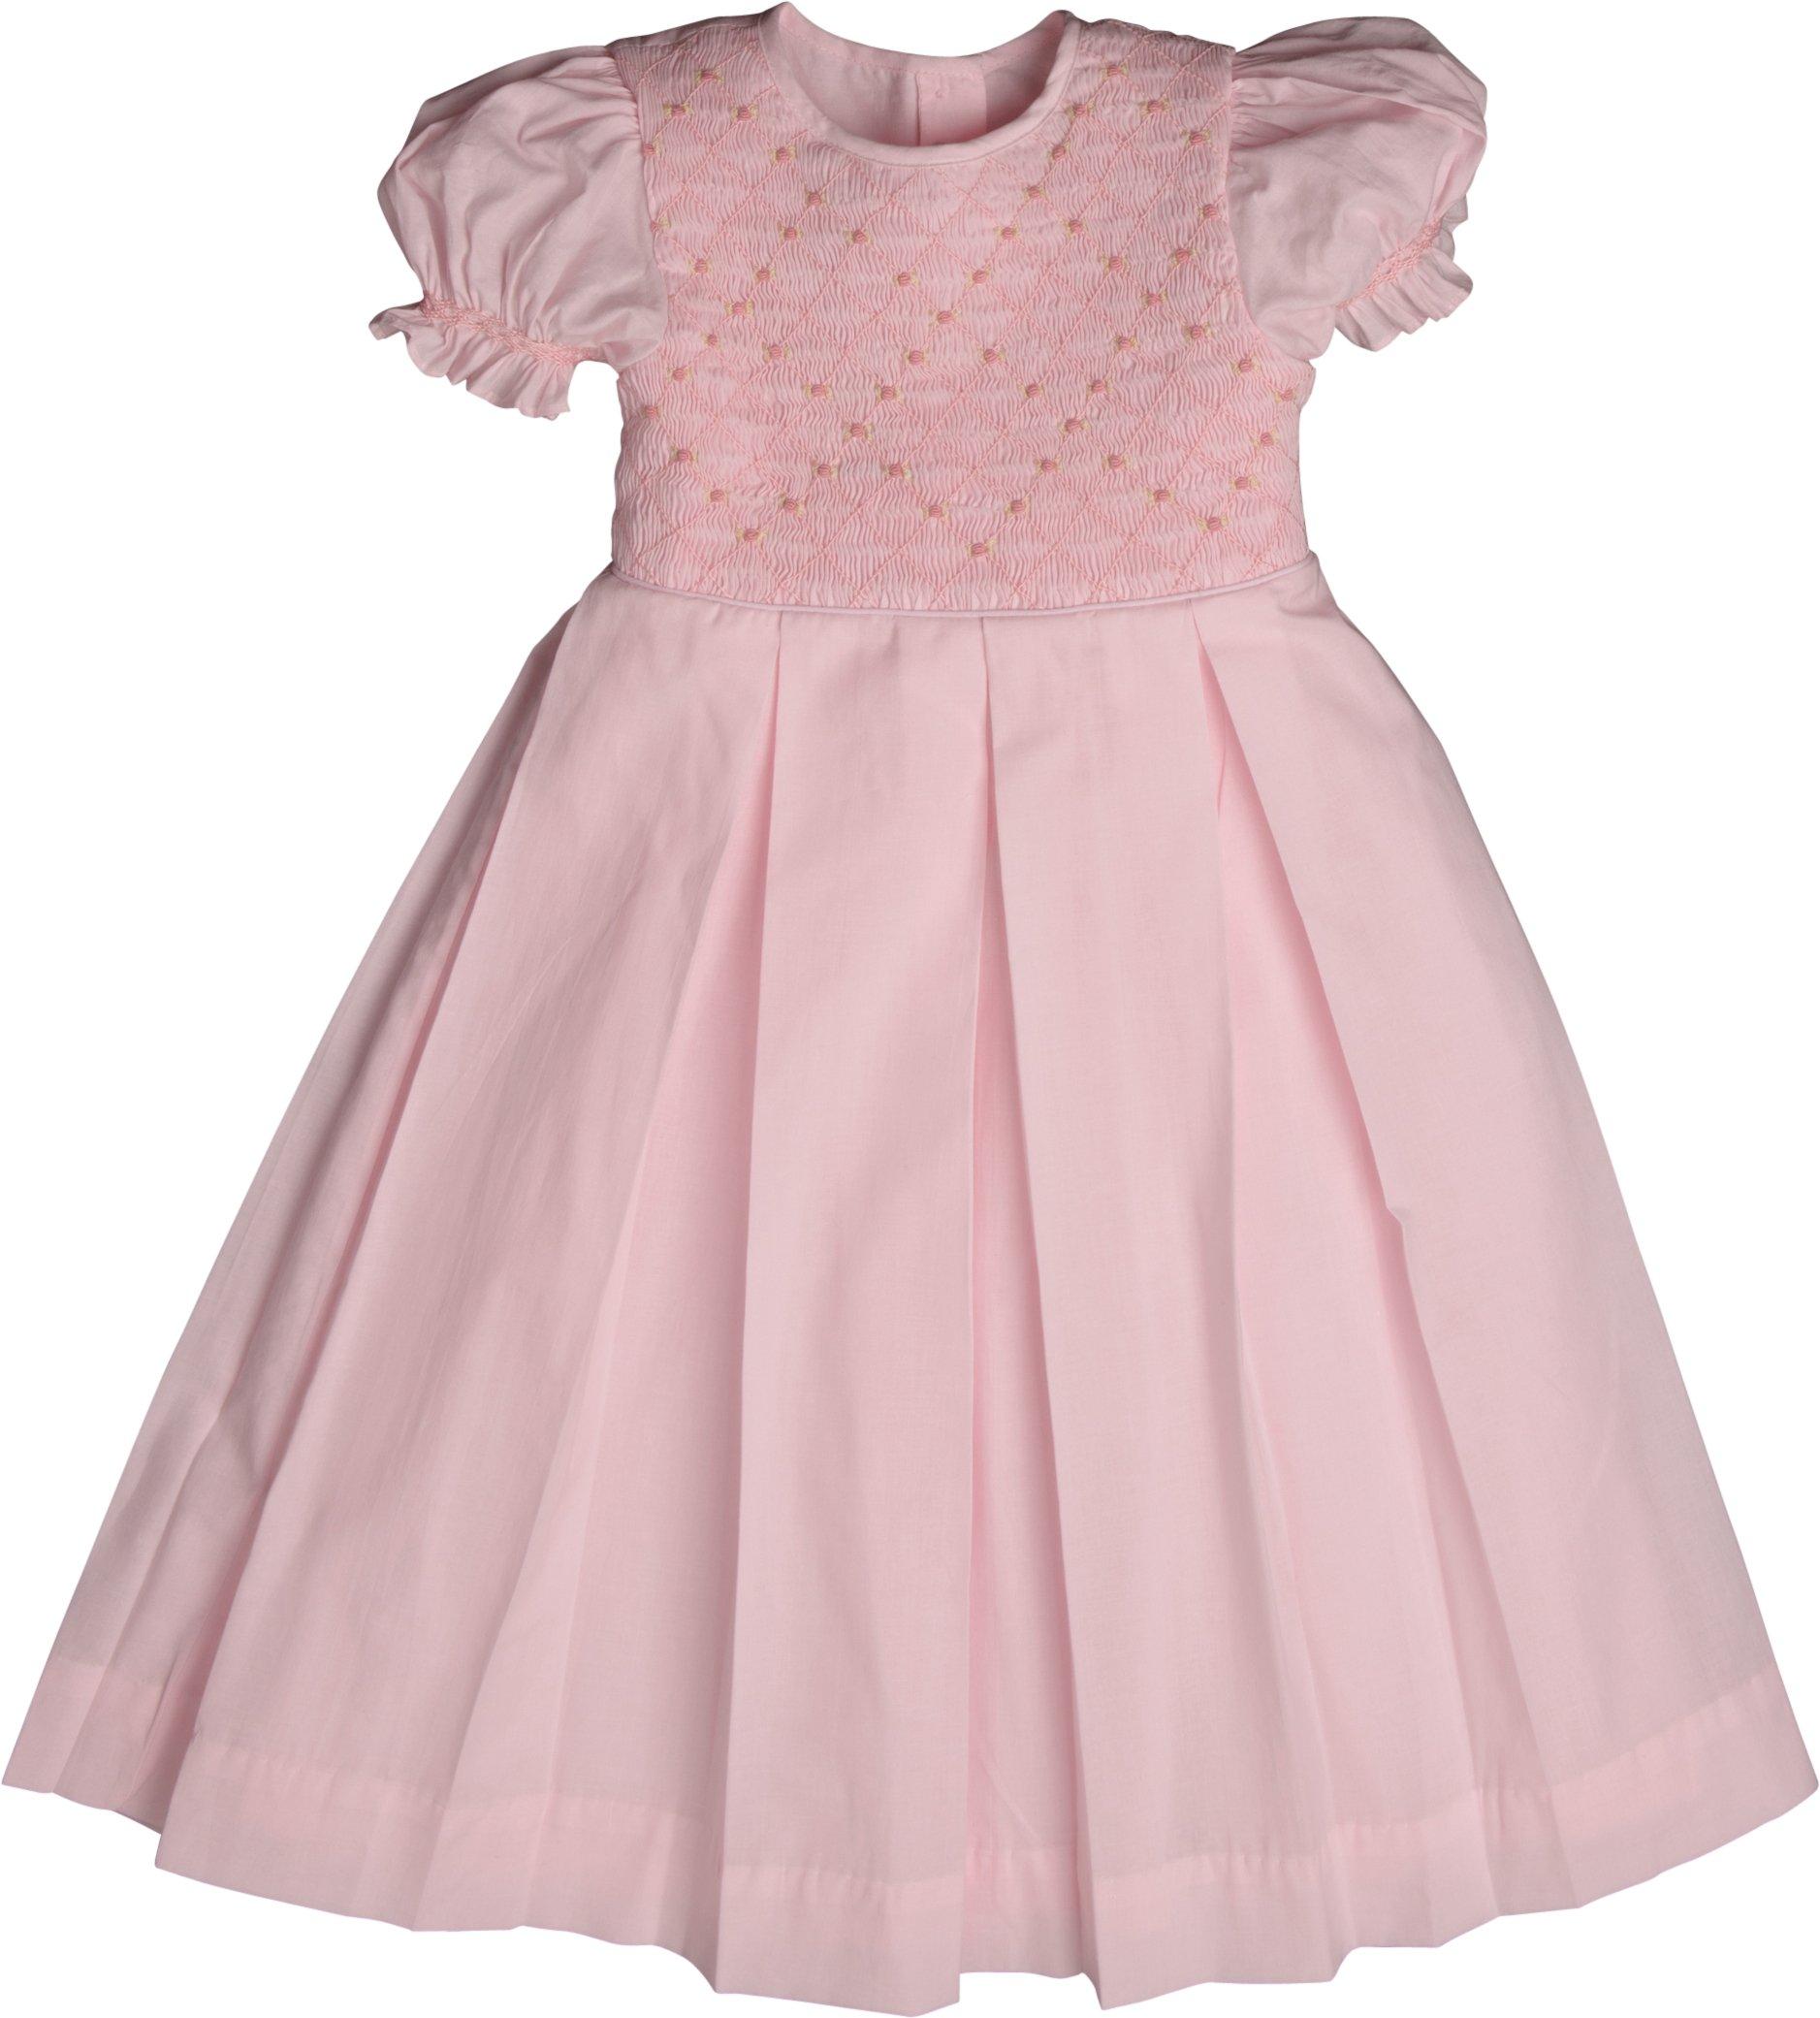 Strasburg Children Little Girls Addison Smocked Dress Pink (3)